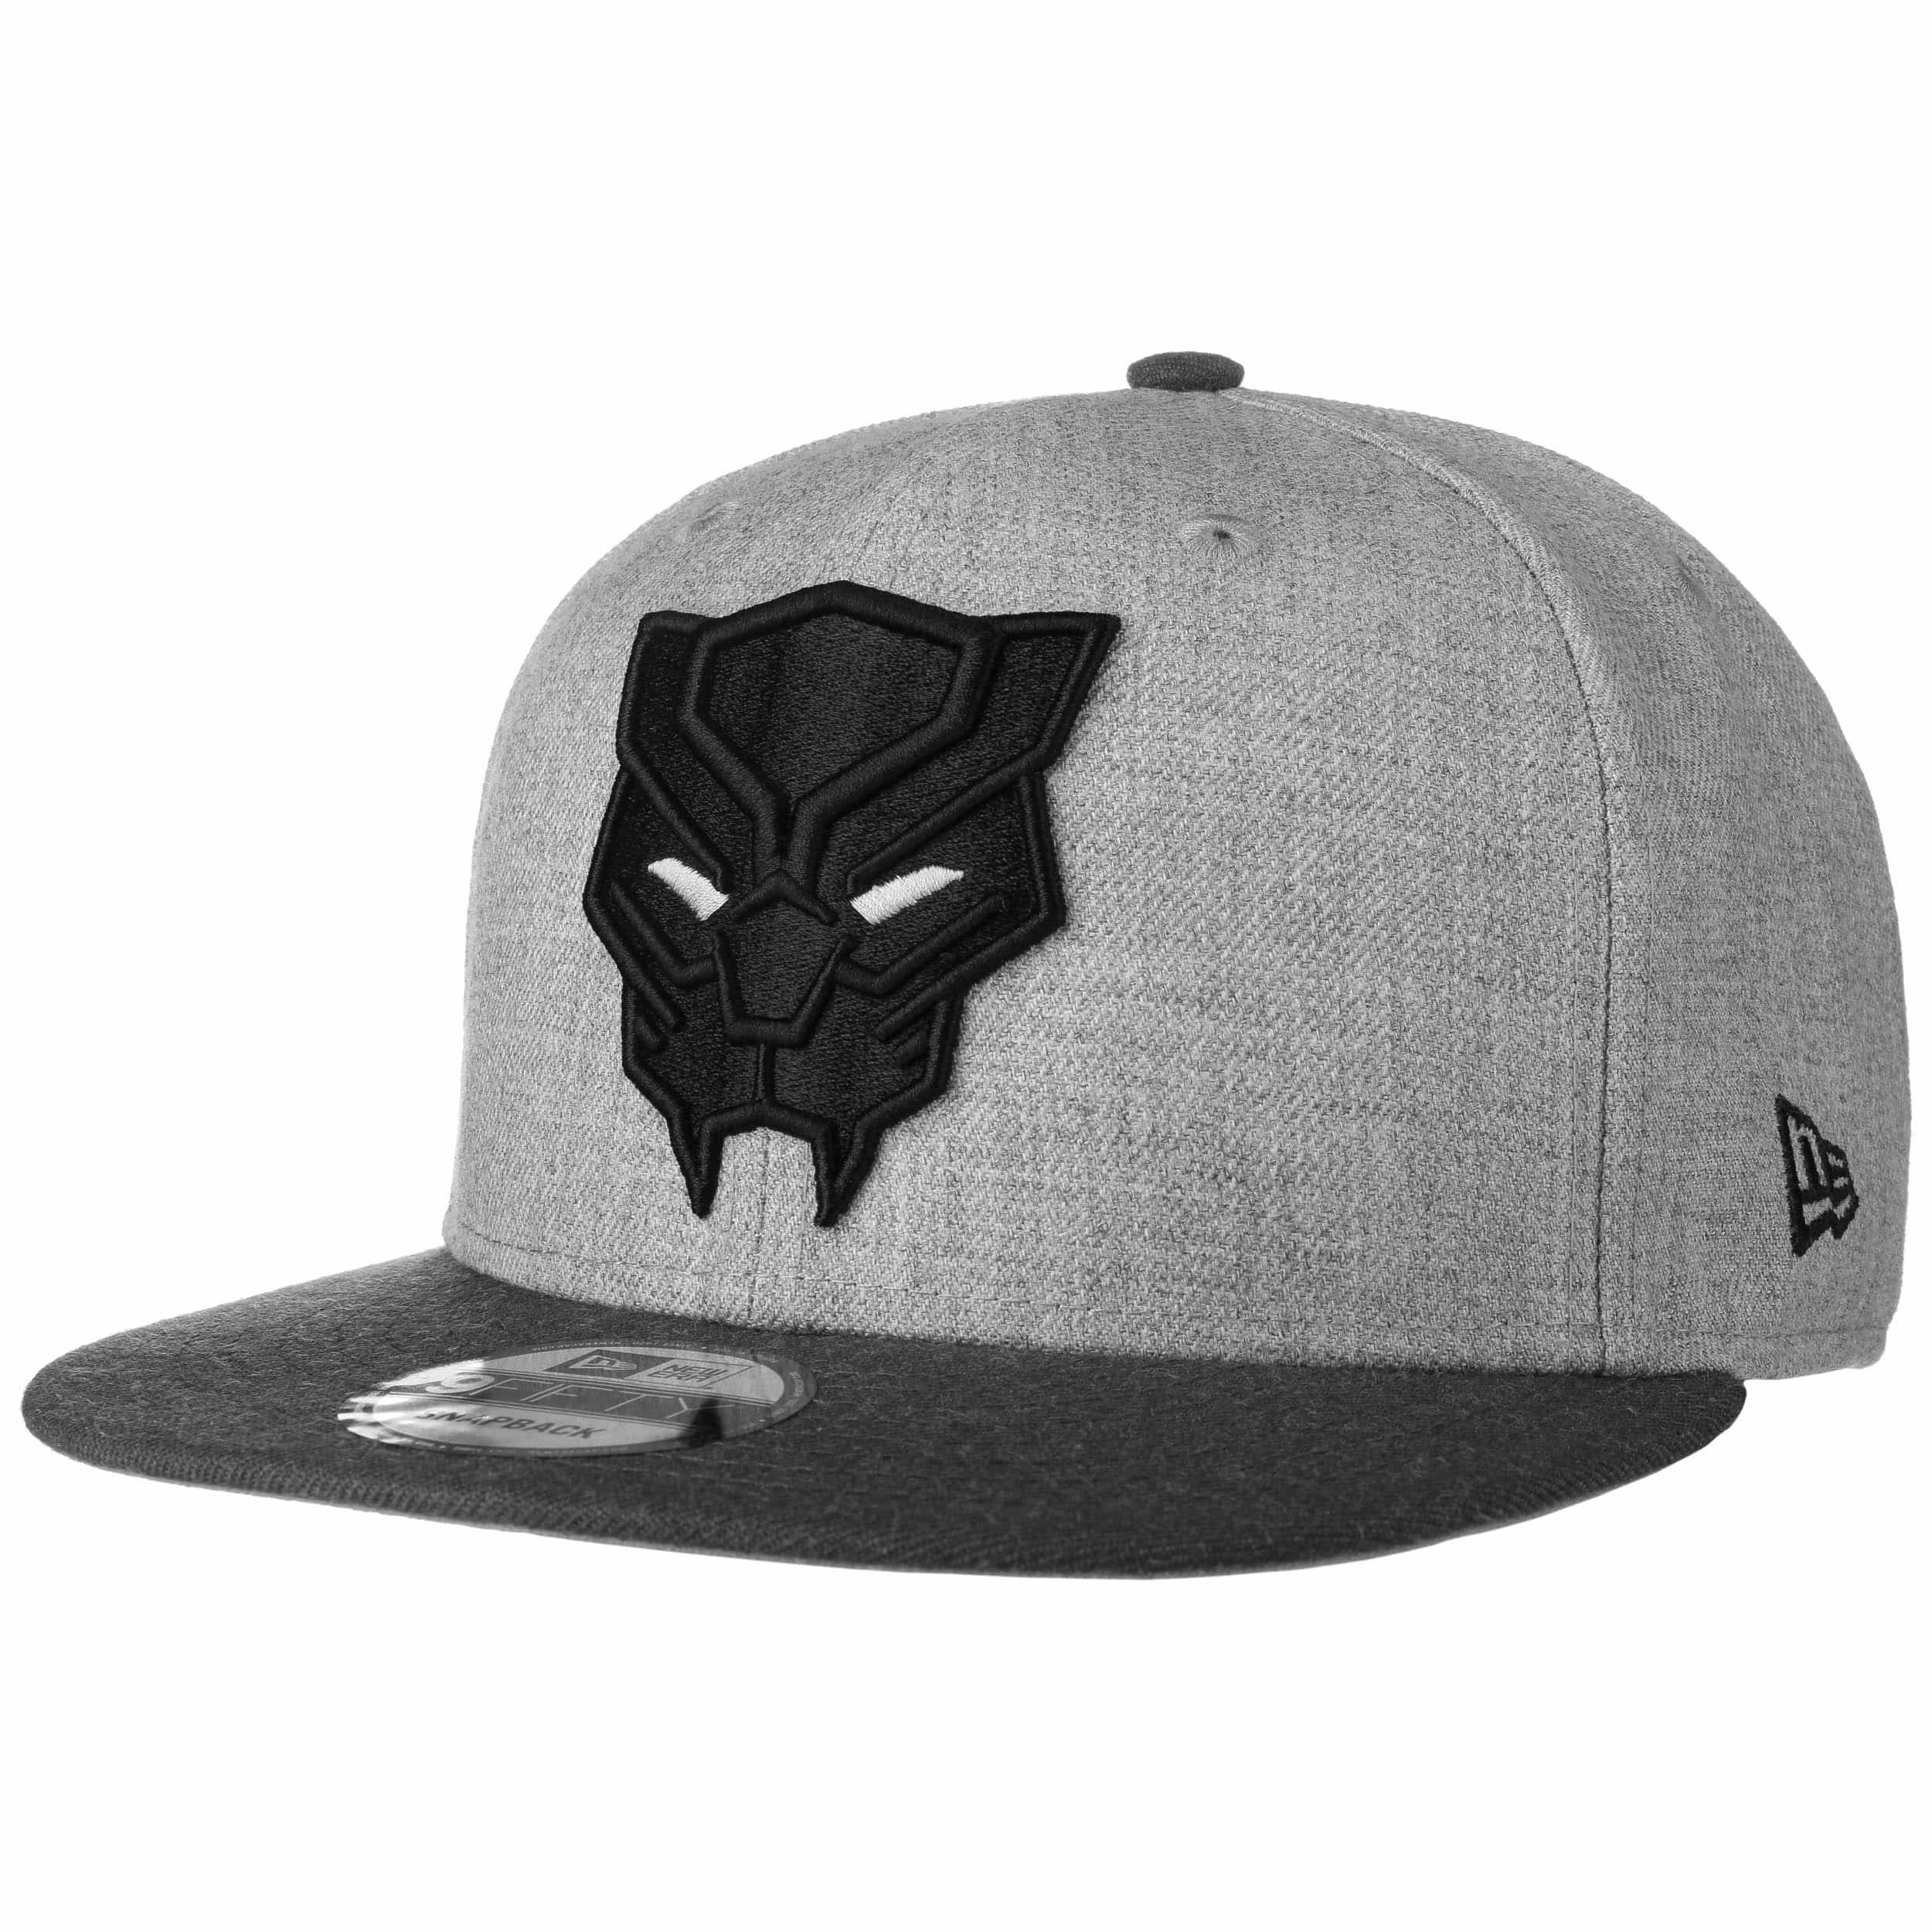 b63b0c891 9Fifty Black Panther Graphite Cap by New Era